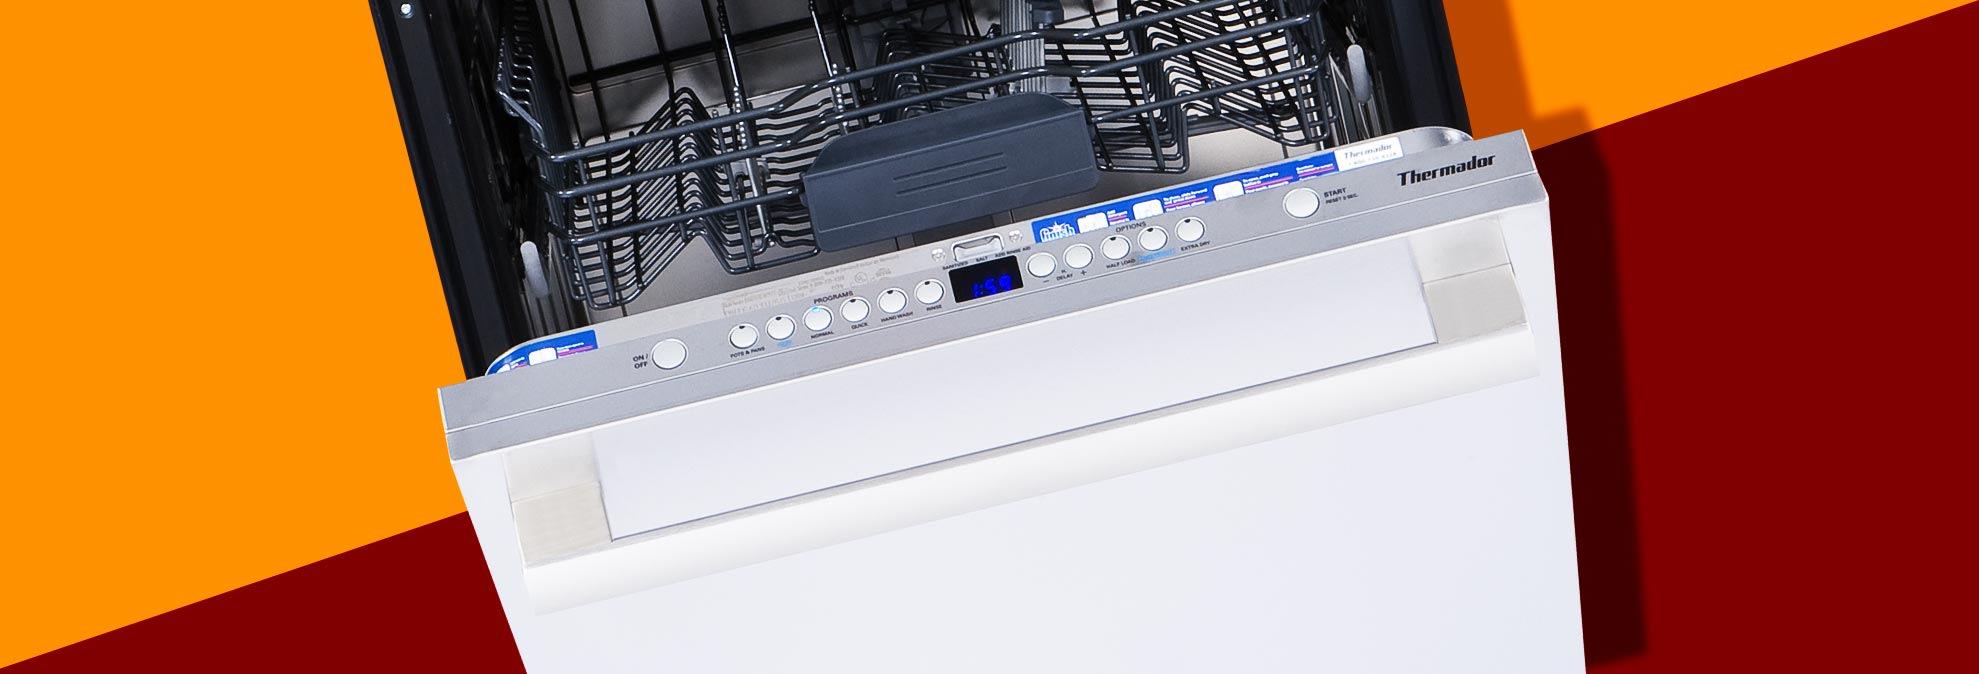 dishwasher bosch installation instructions